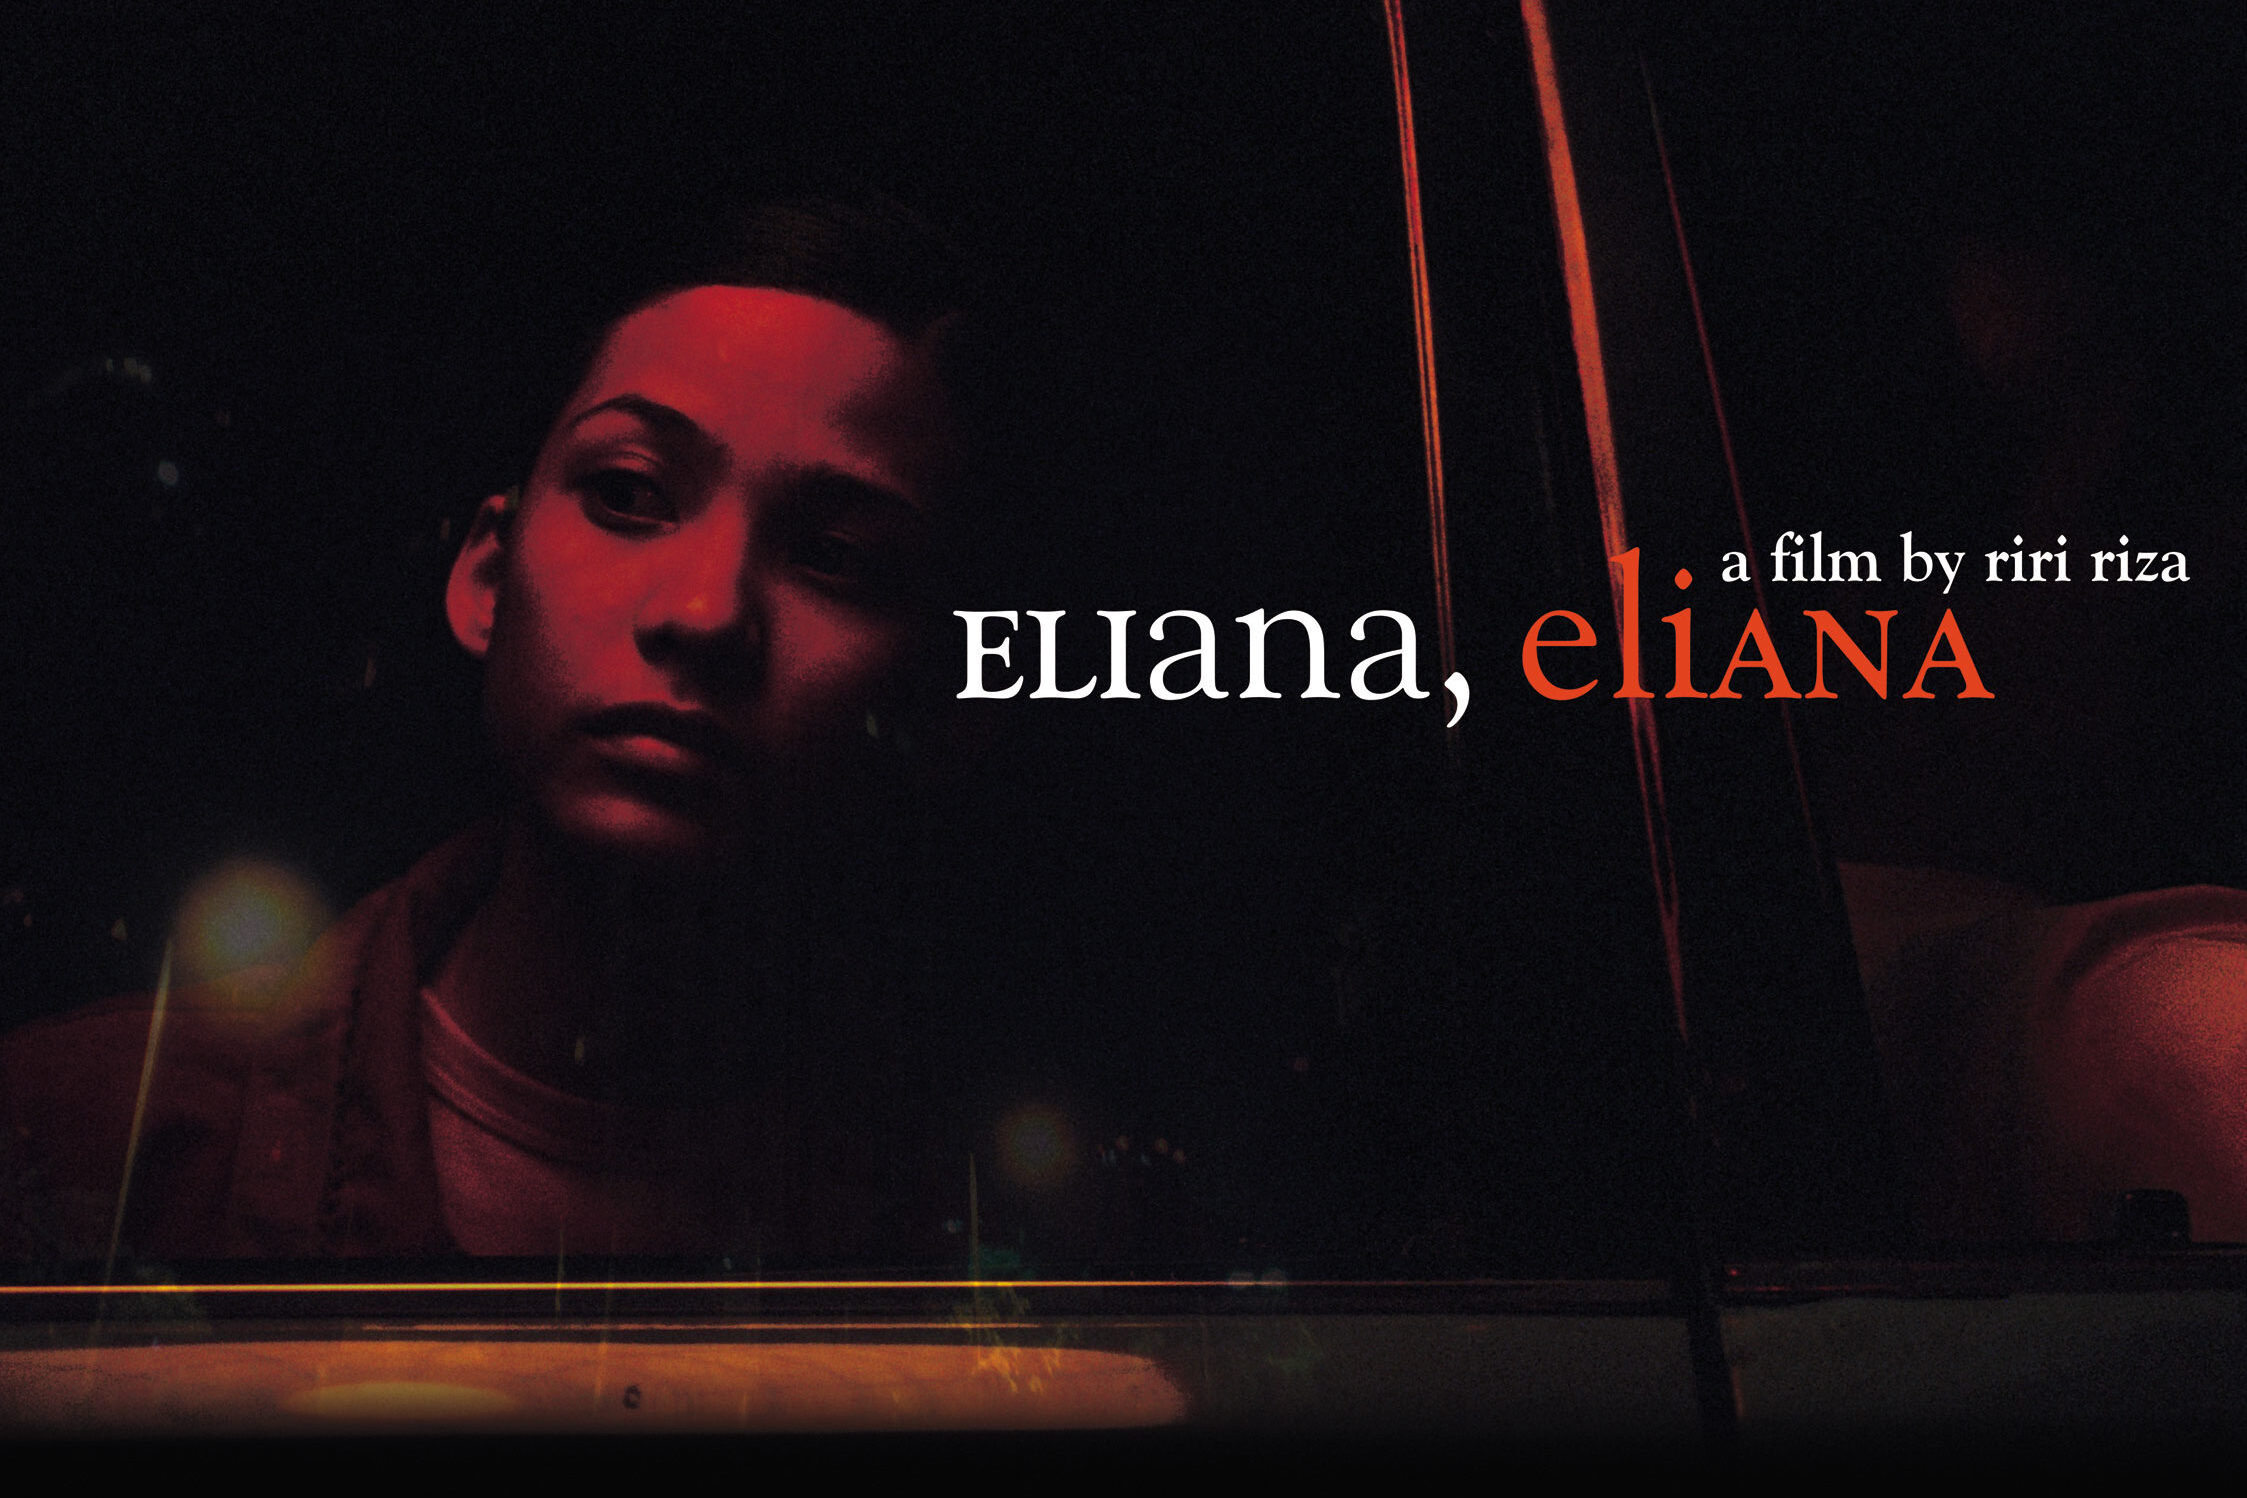 <!--:id-->Eliana, Eliana<!--:--><!--:en-->Eliana, Eliana<!--:-->